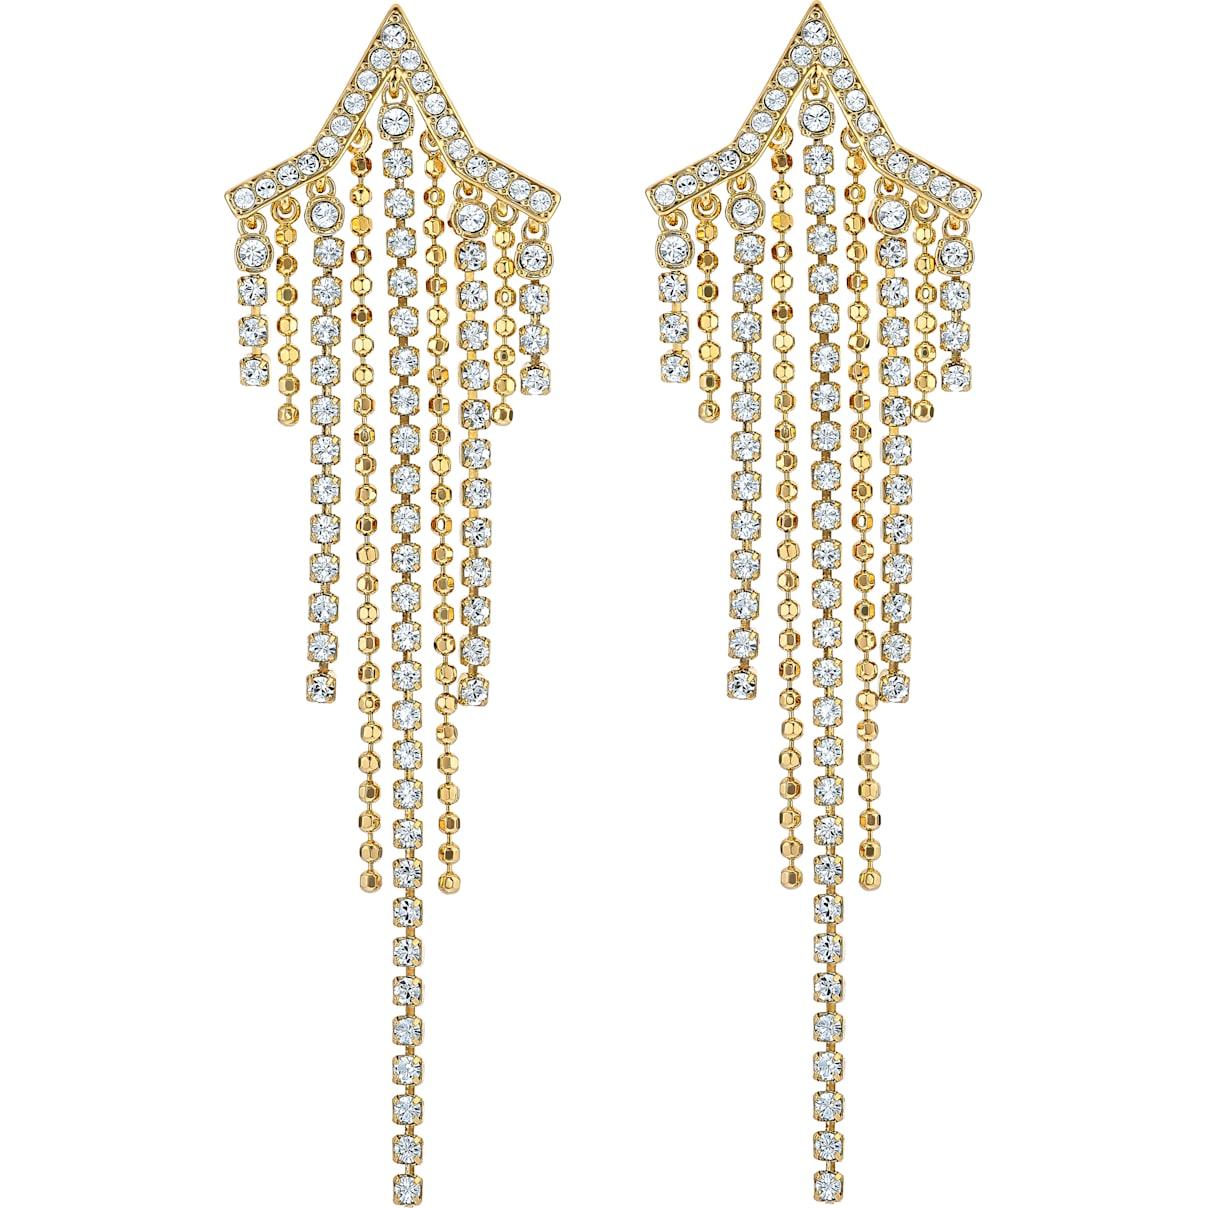 Swarovski Fit Star Pierced Tassell Earrings, White, Gold-tone plated